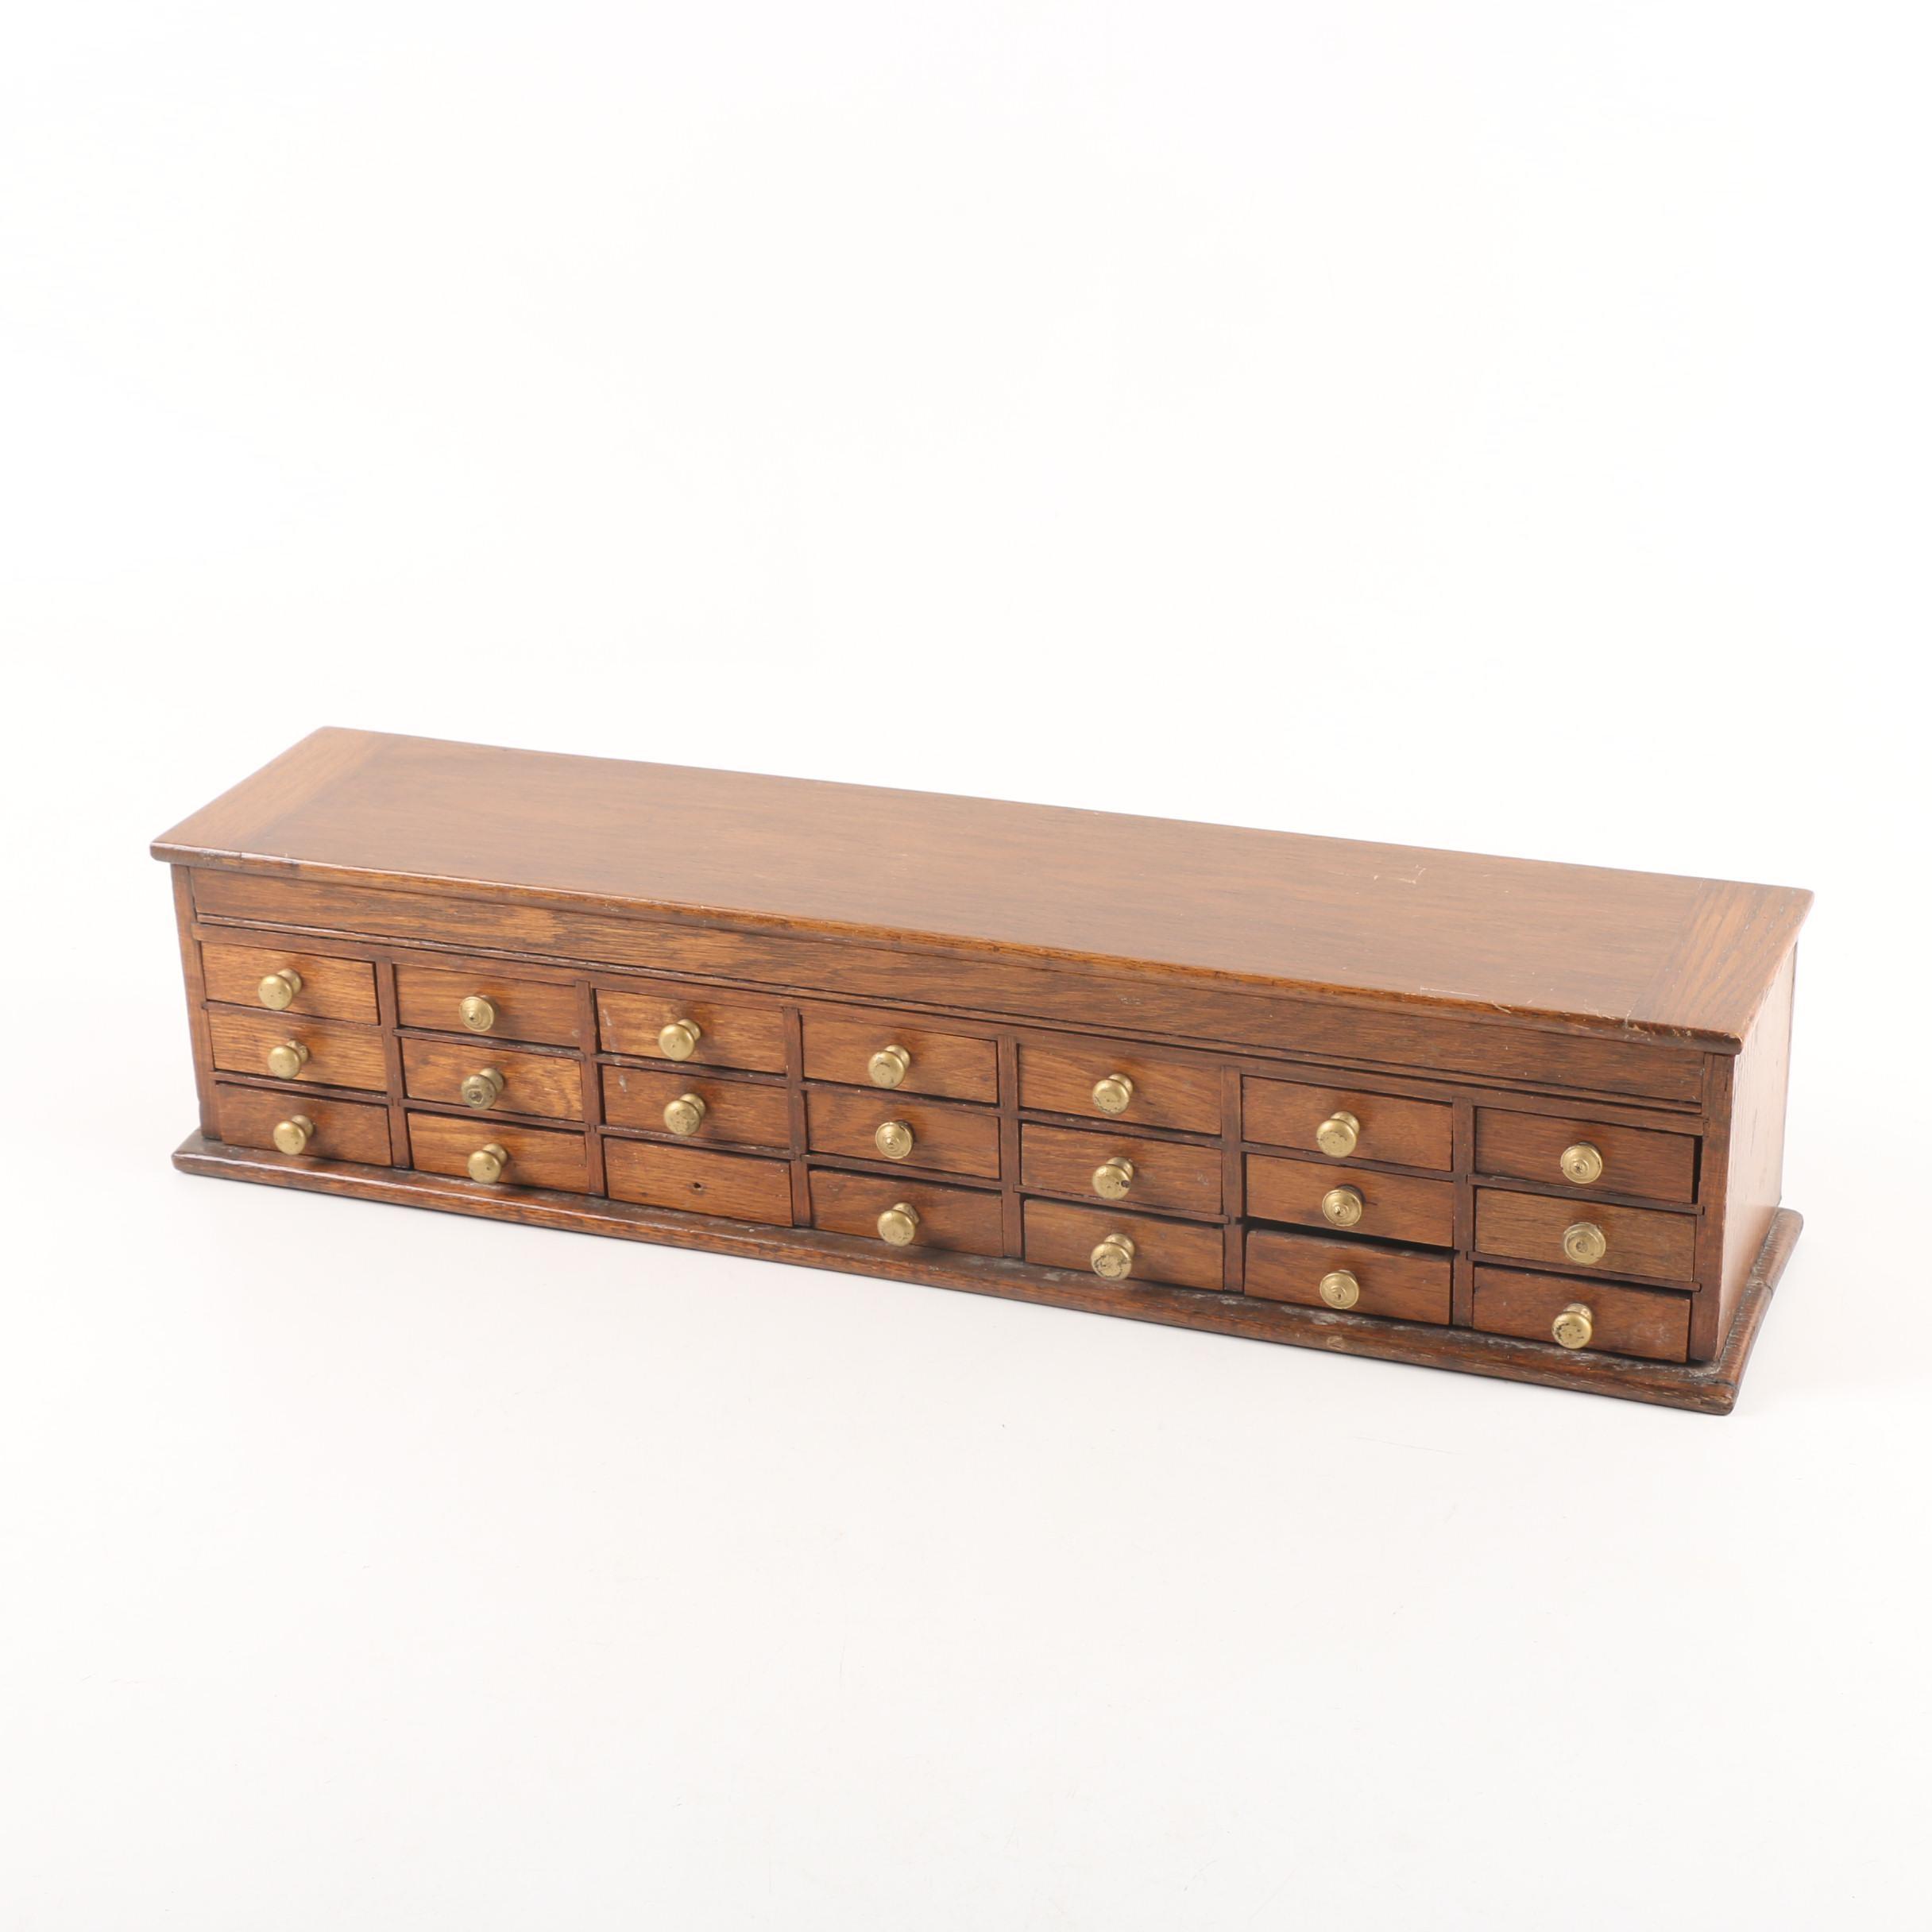 Vintage Oak Storage Box ...  sc 1 st  EBTH.com & Vintage Oak Storage Box : EBTH